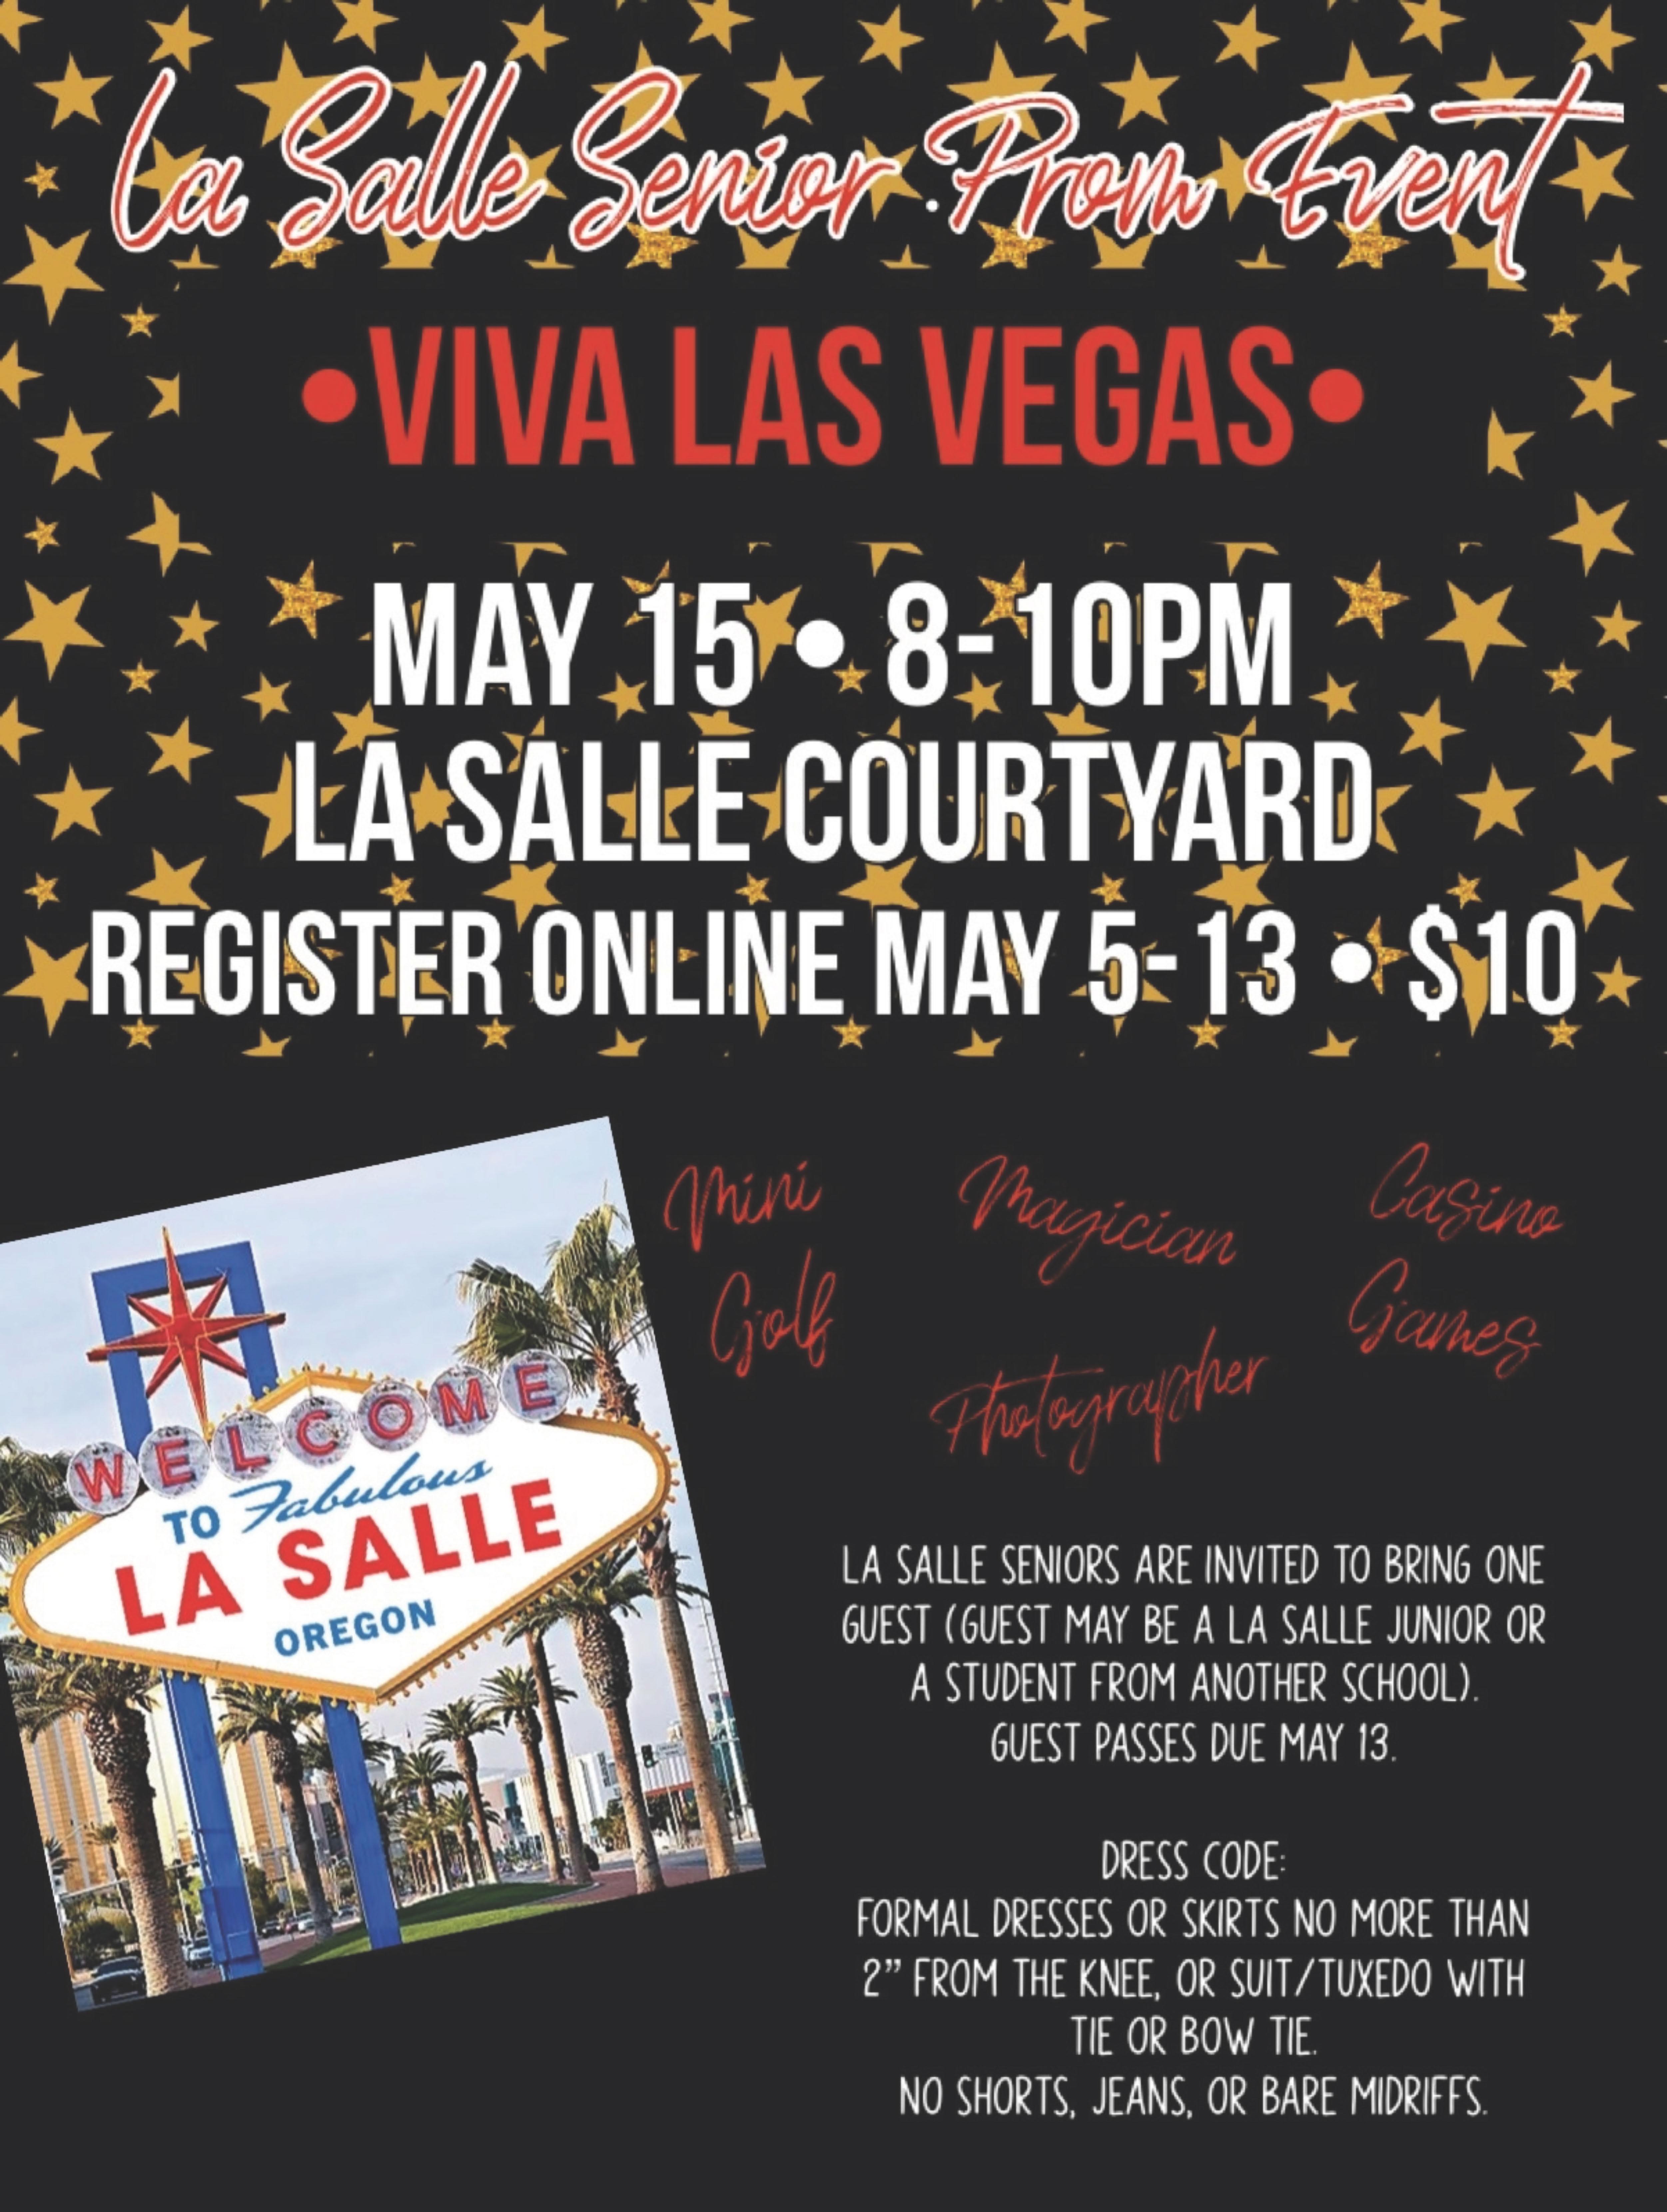 Prom promo flyer for Viva Las Vegas event